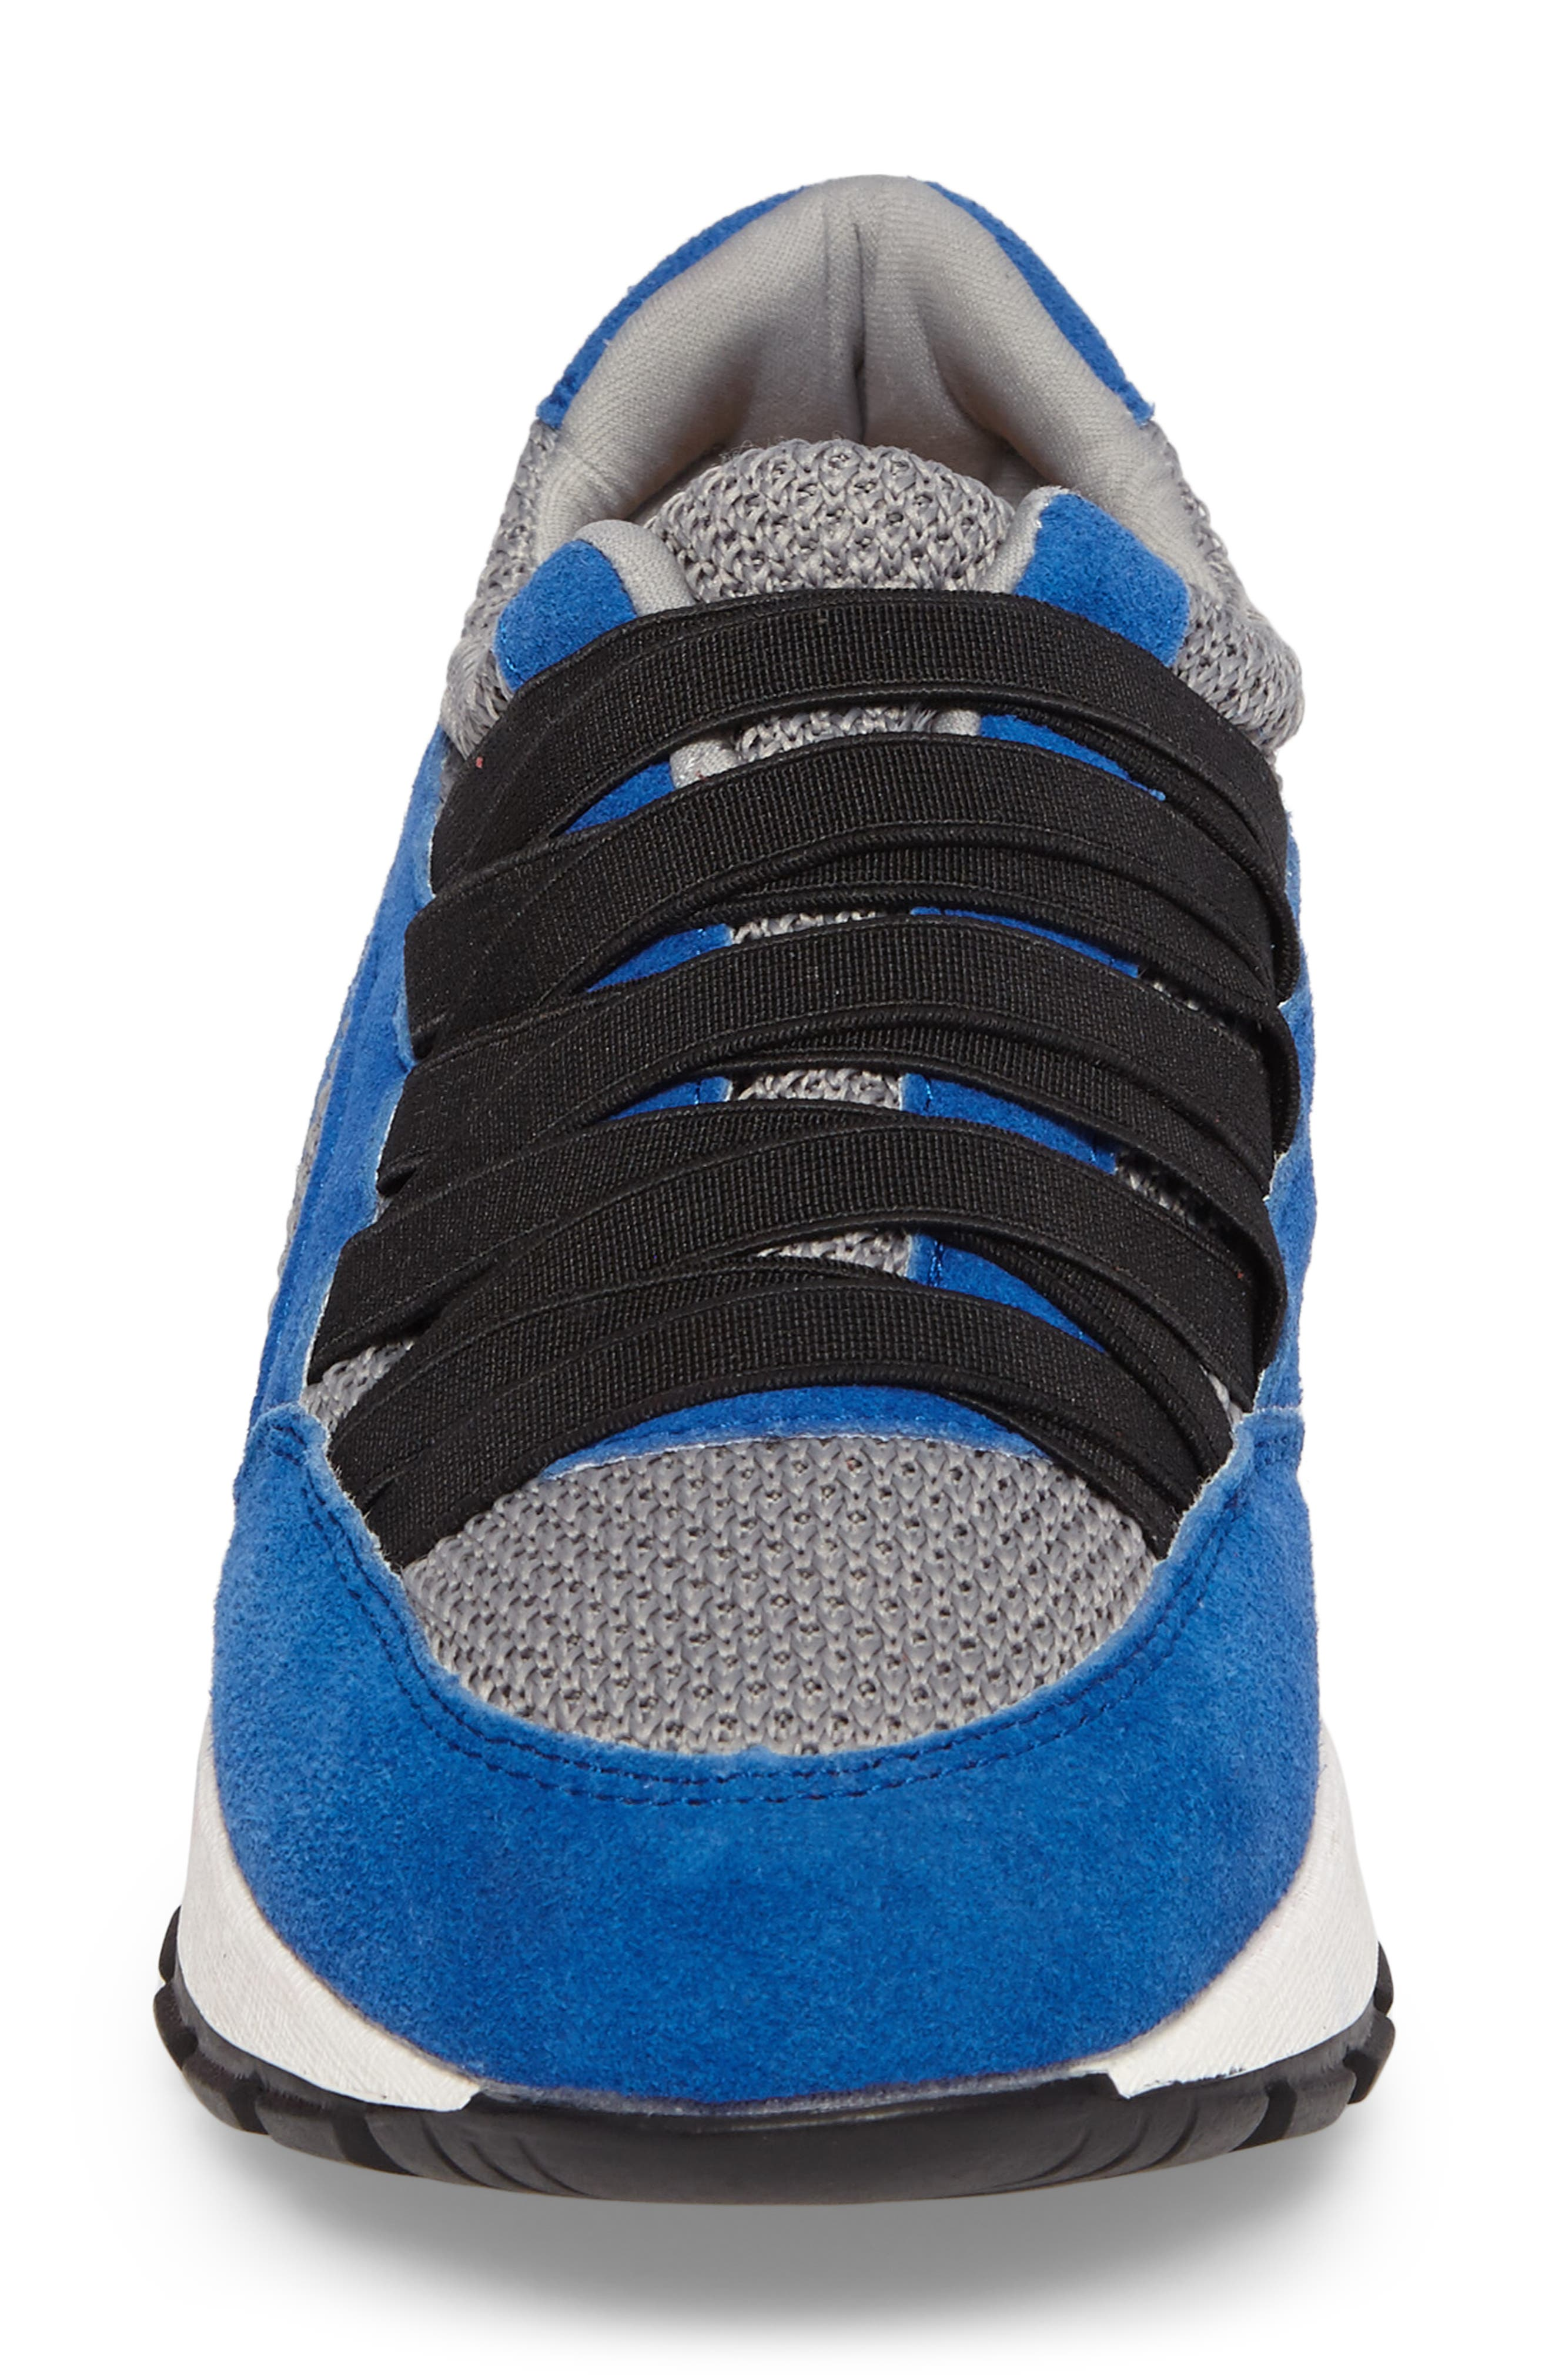 BERNIE MEV., Bernie Mev Tara Cano Sneaker, Alternate thumbnail 4, color, ROYAL BLUE/ GREY FABRIC